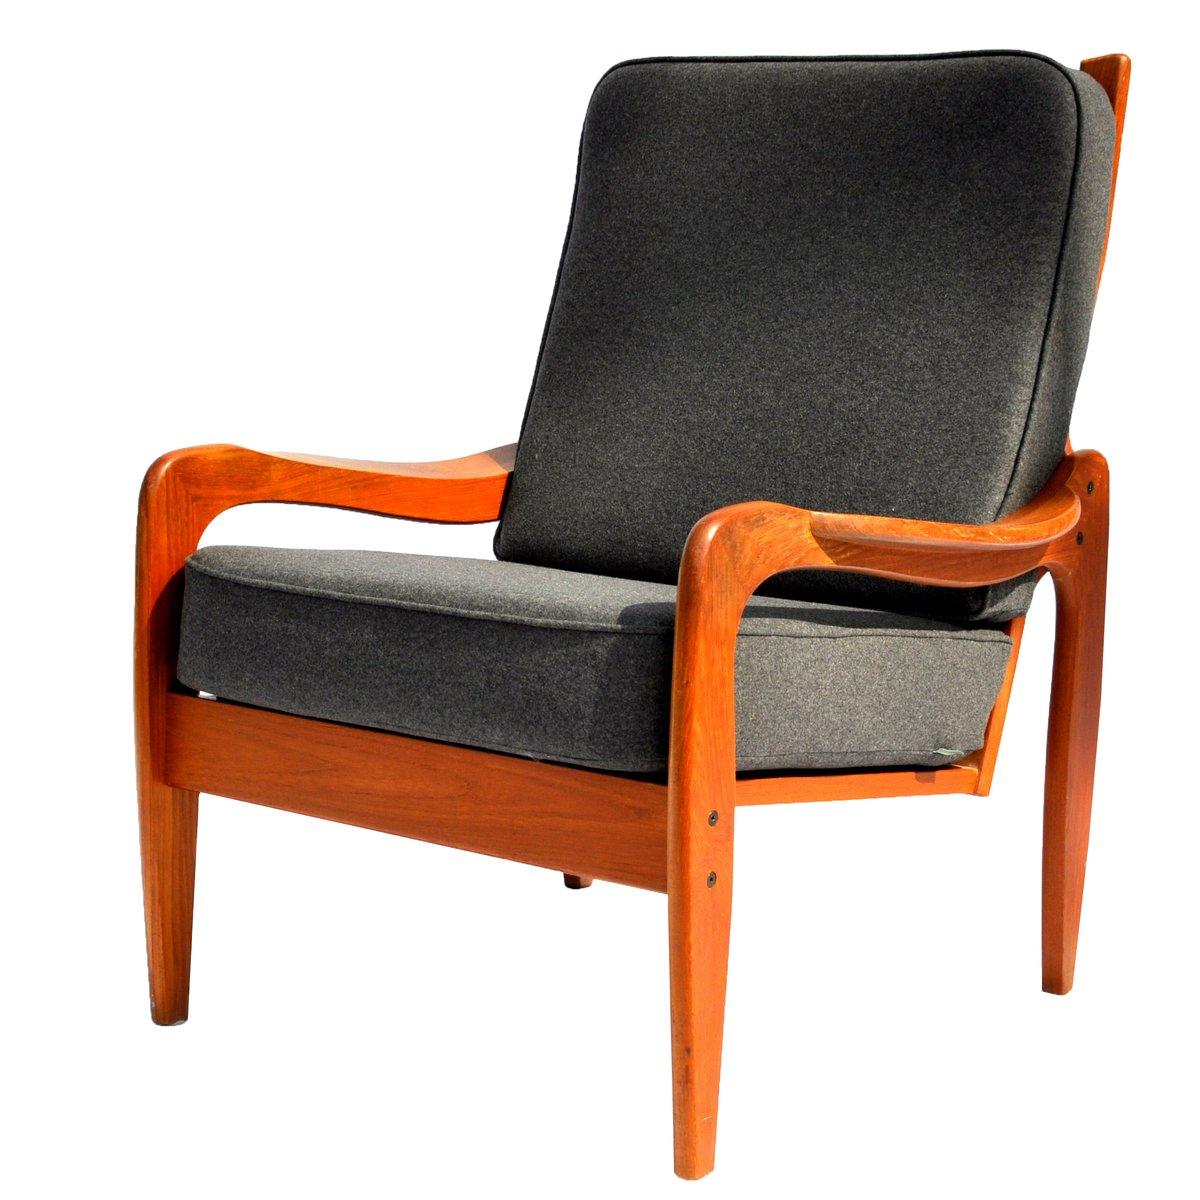 Danish Highback Teak Chair From Komfort For Sale At Pamono